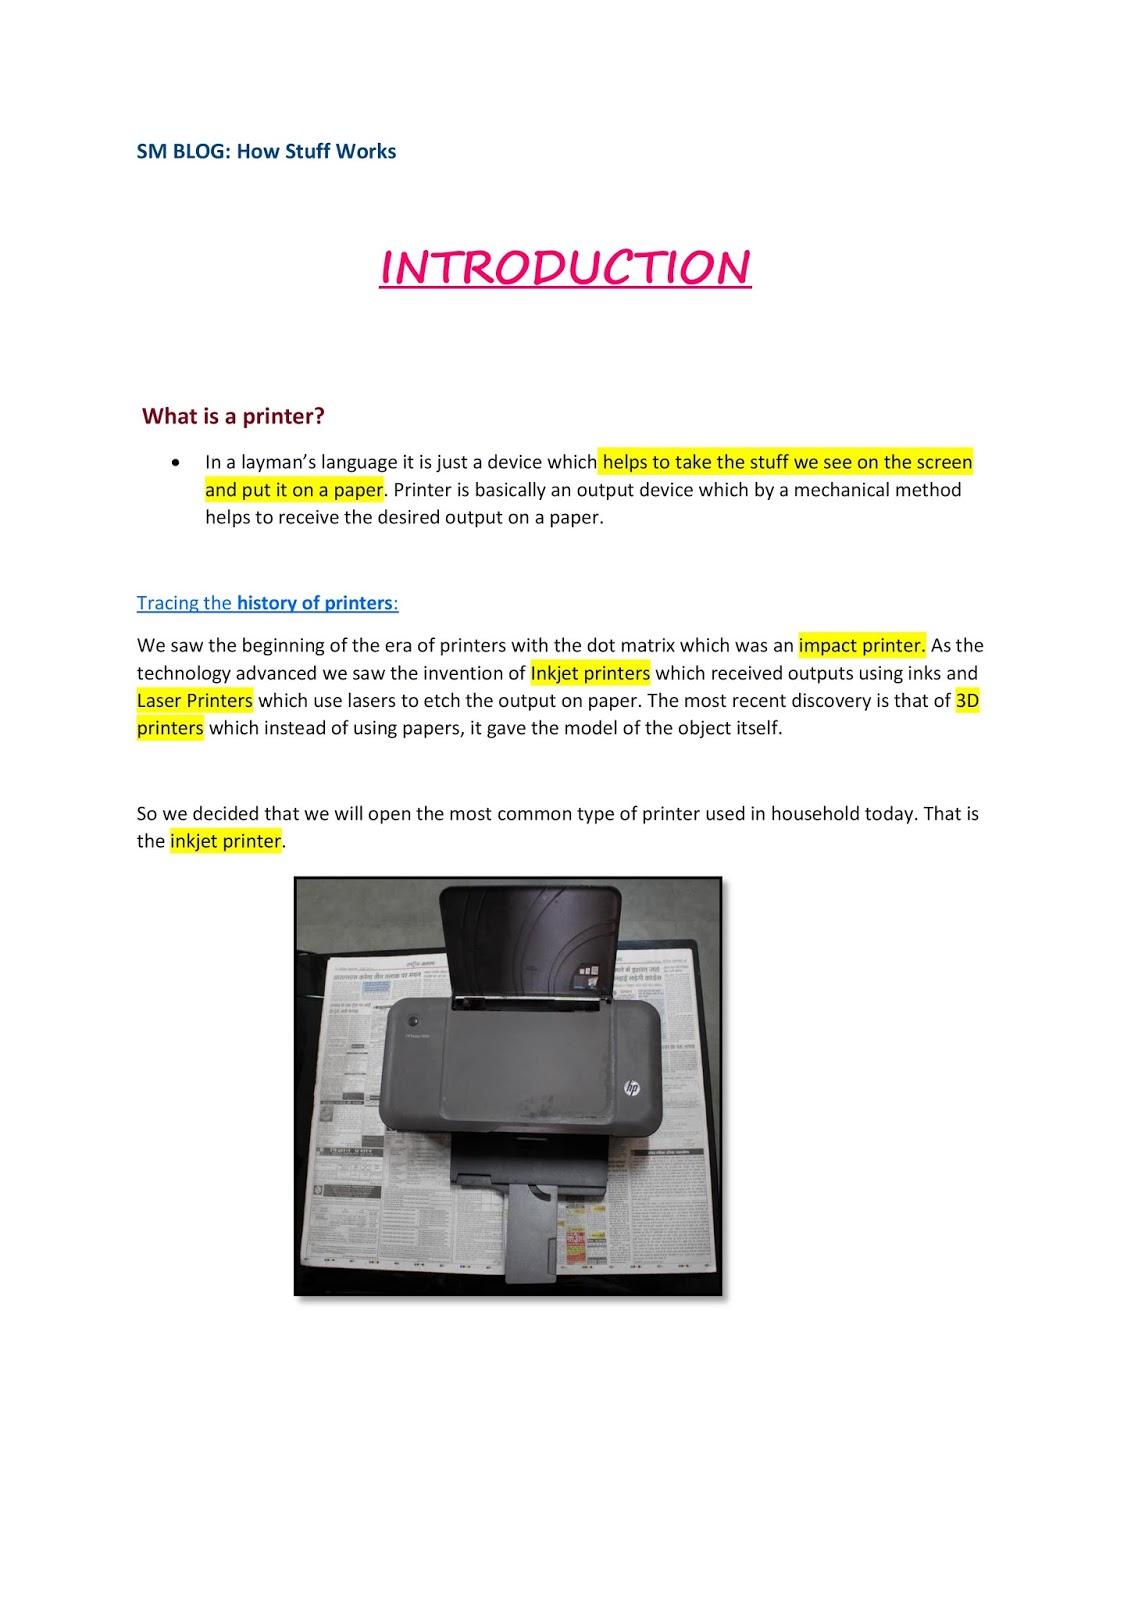 SM BLOG 2016: How Inkjet Printers work | IIITD: Systems